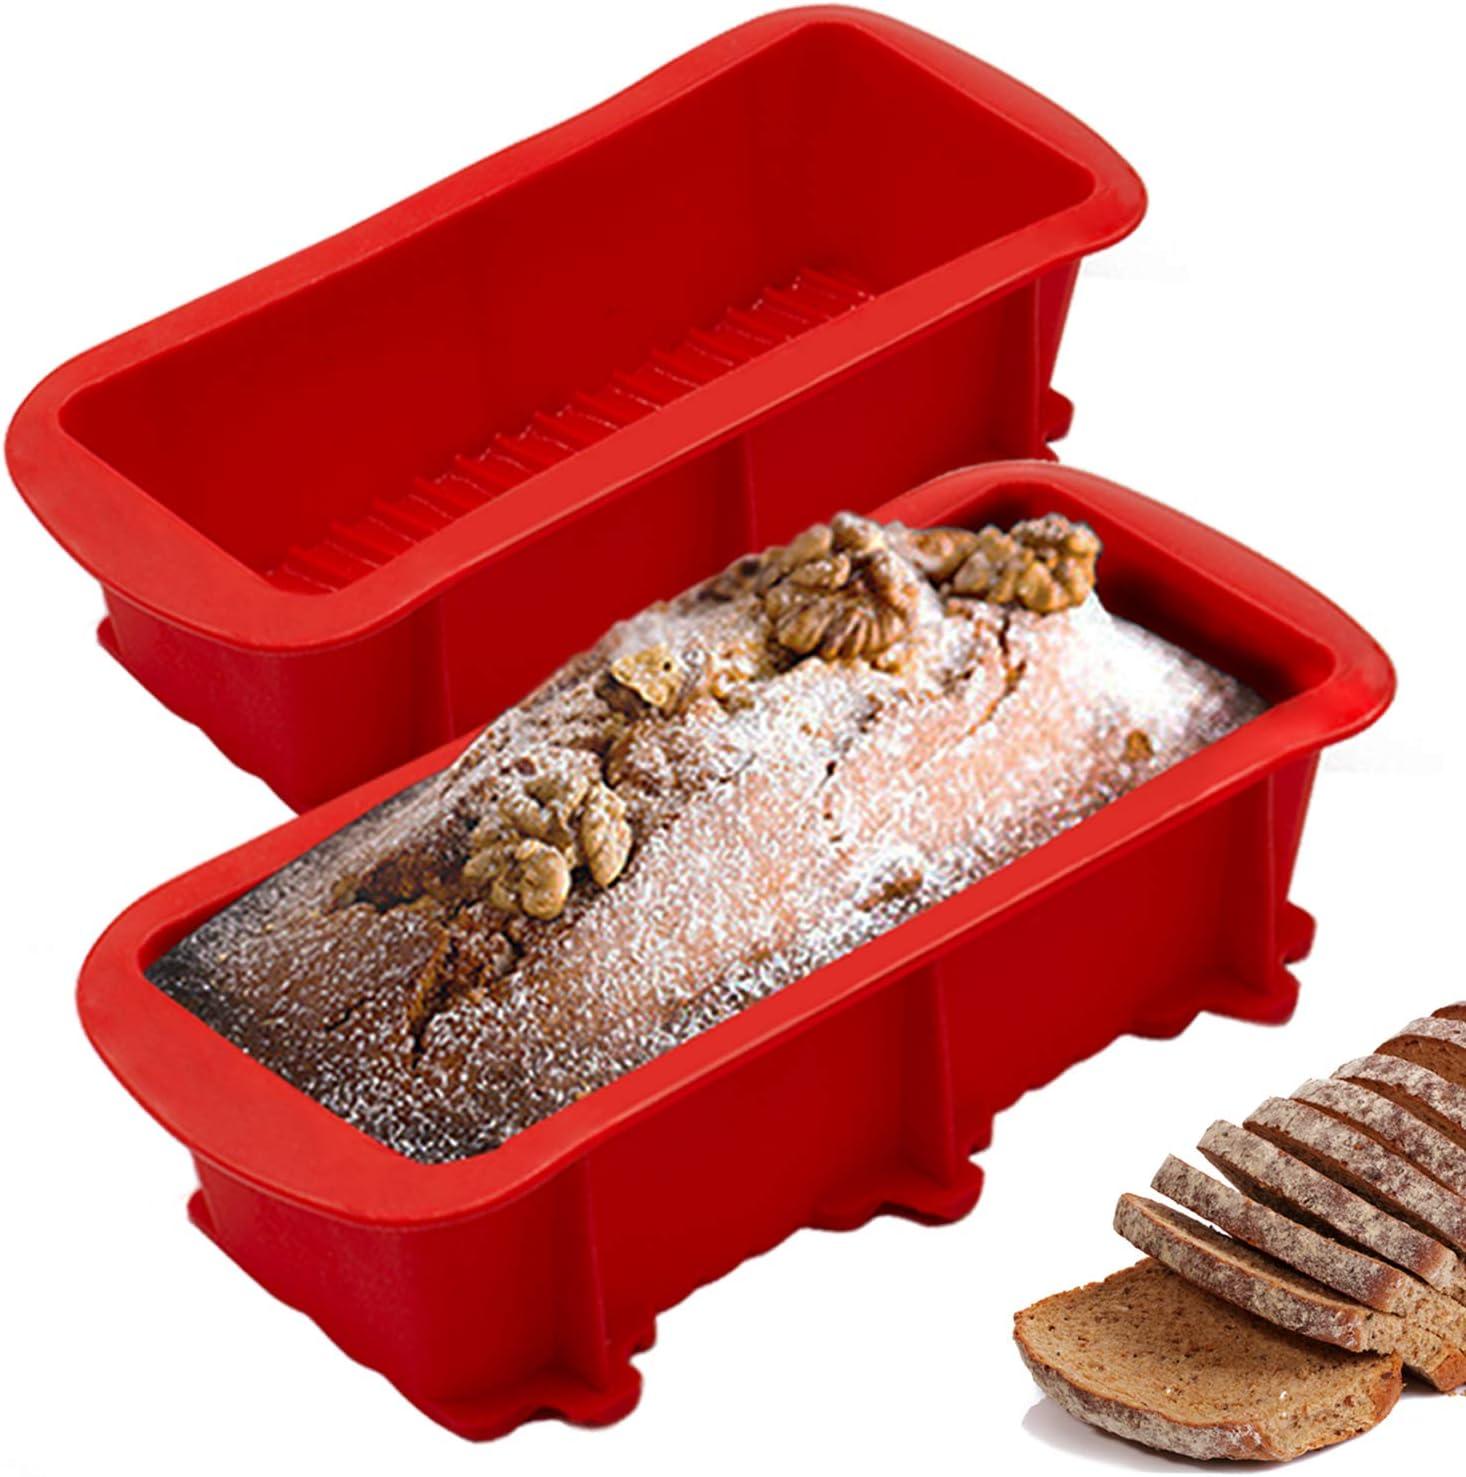 Industrial Bake Molds Kintchen decor Tin mold Bread pan Vintage Aluminum Baking Mold